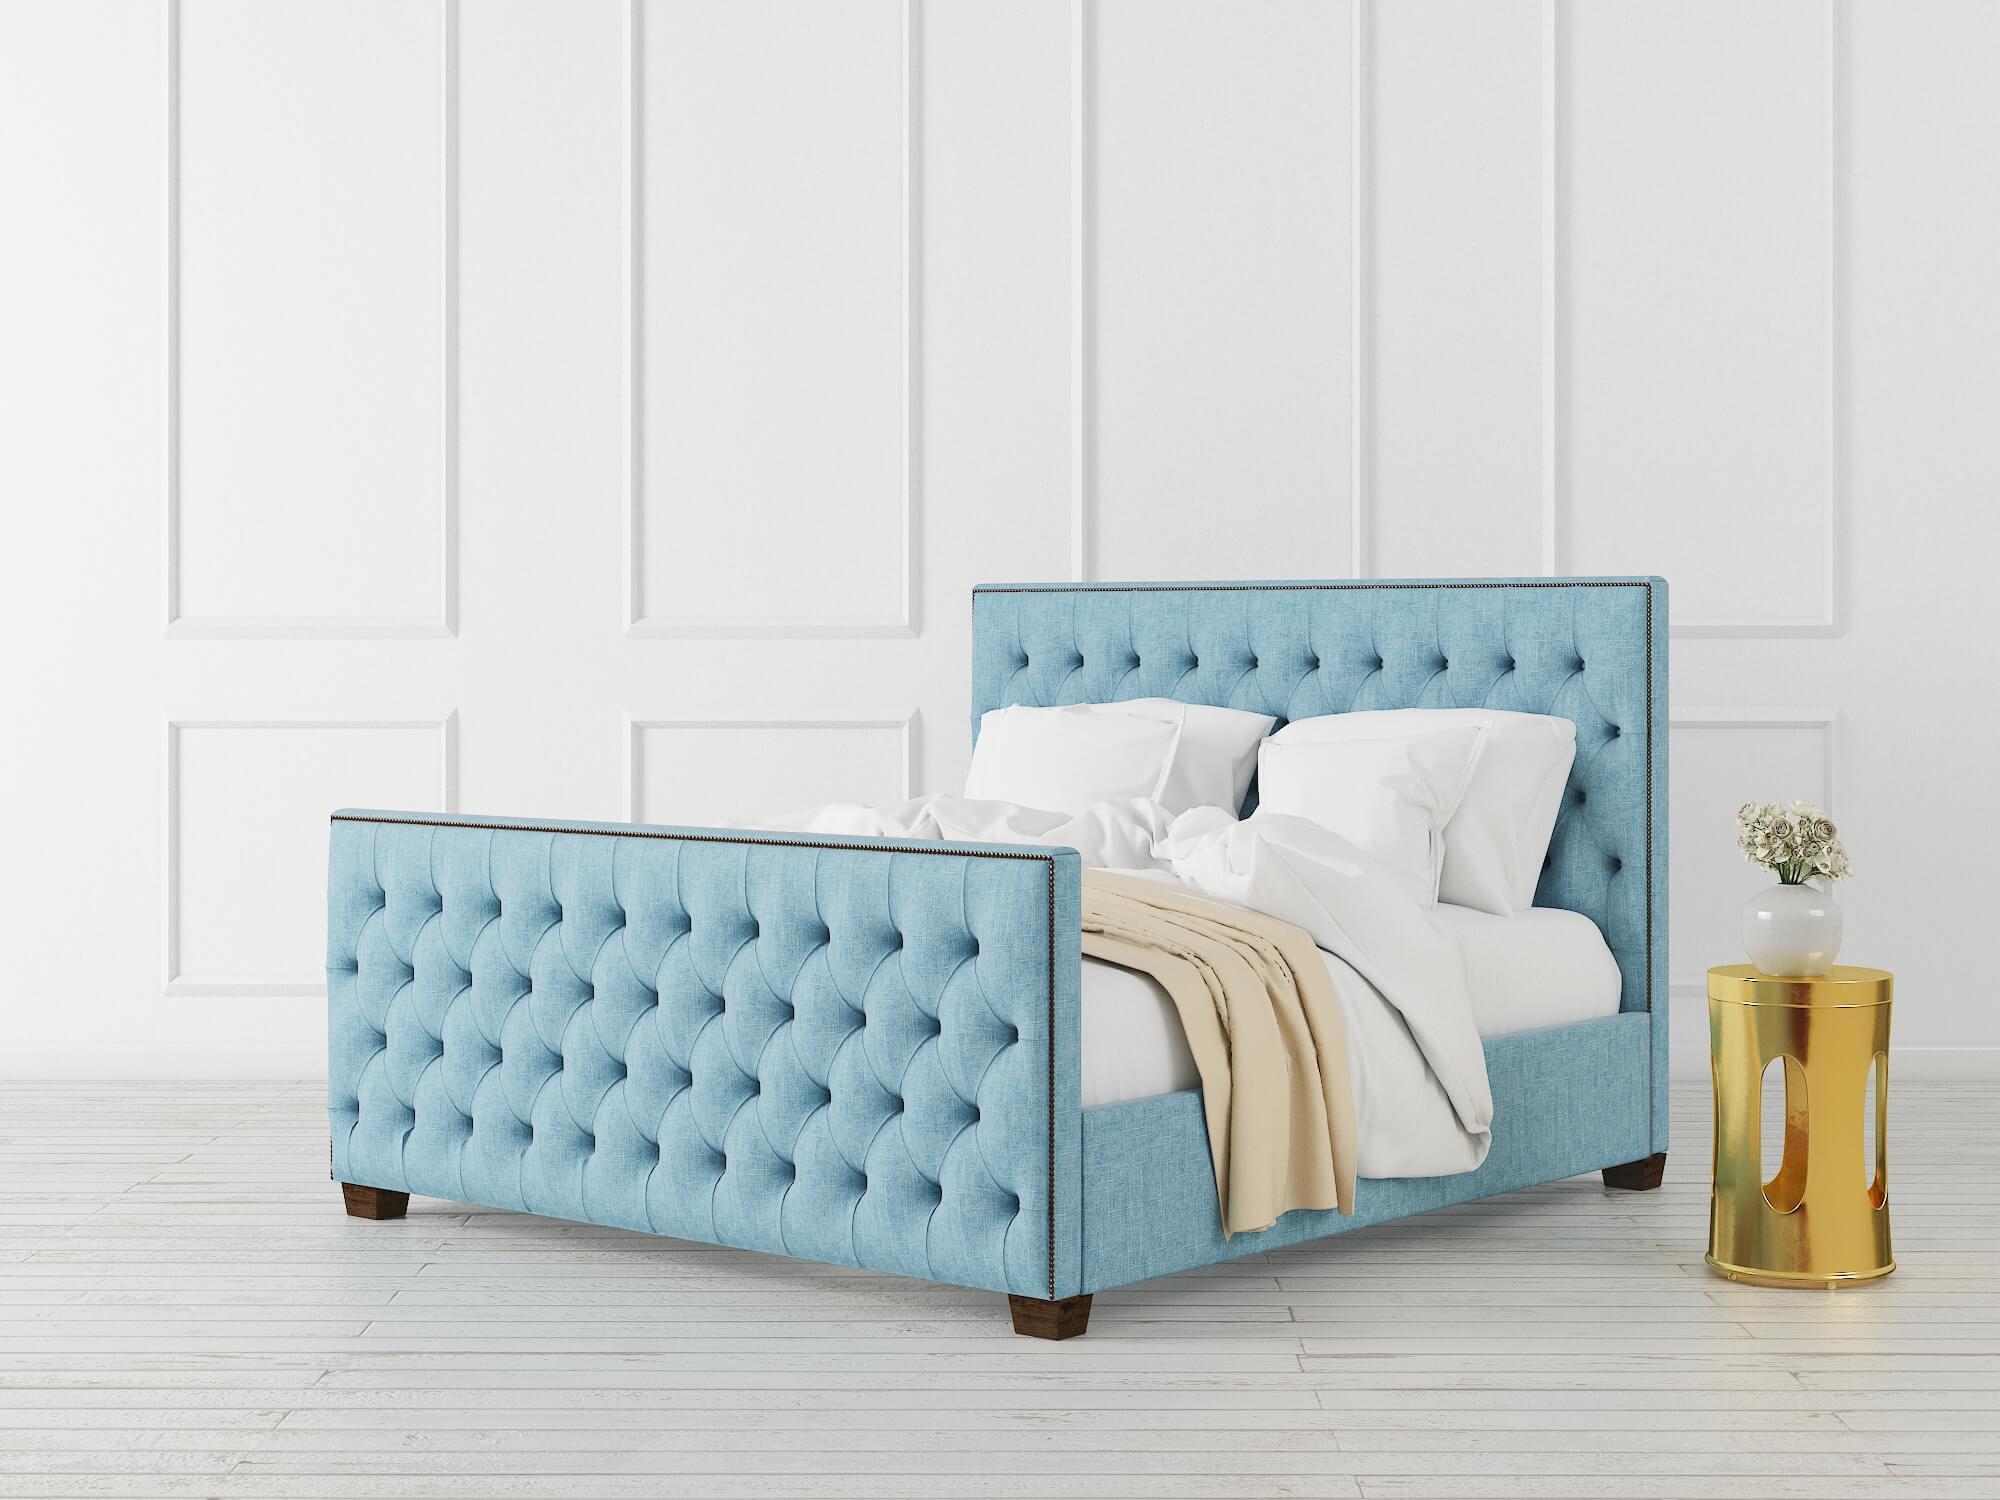 Rimini Bed King Room Background